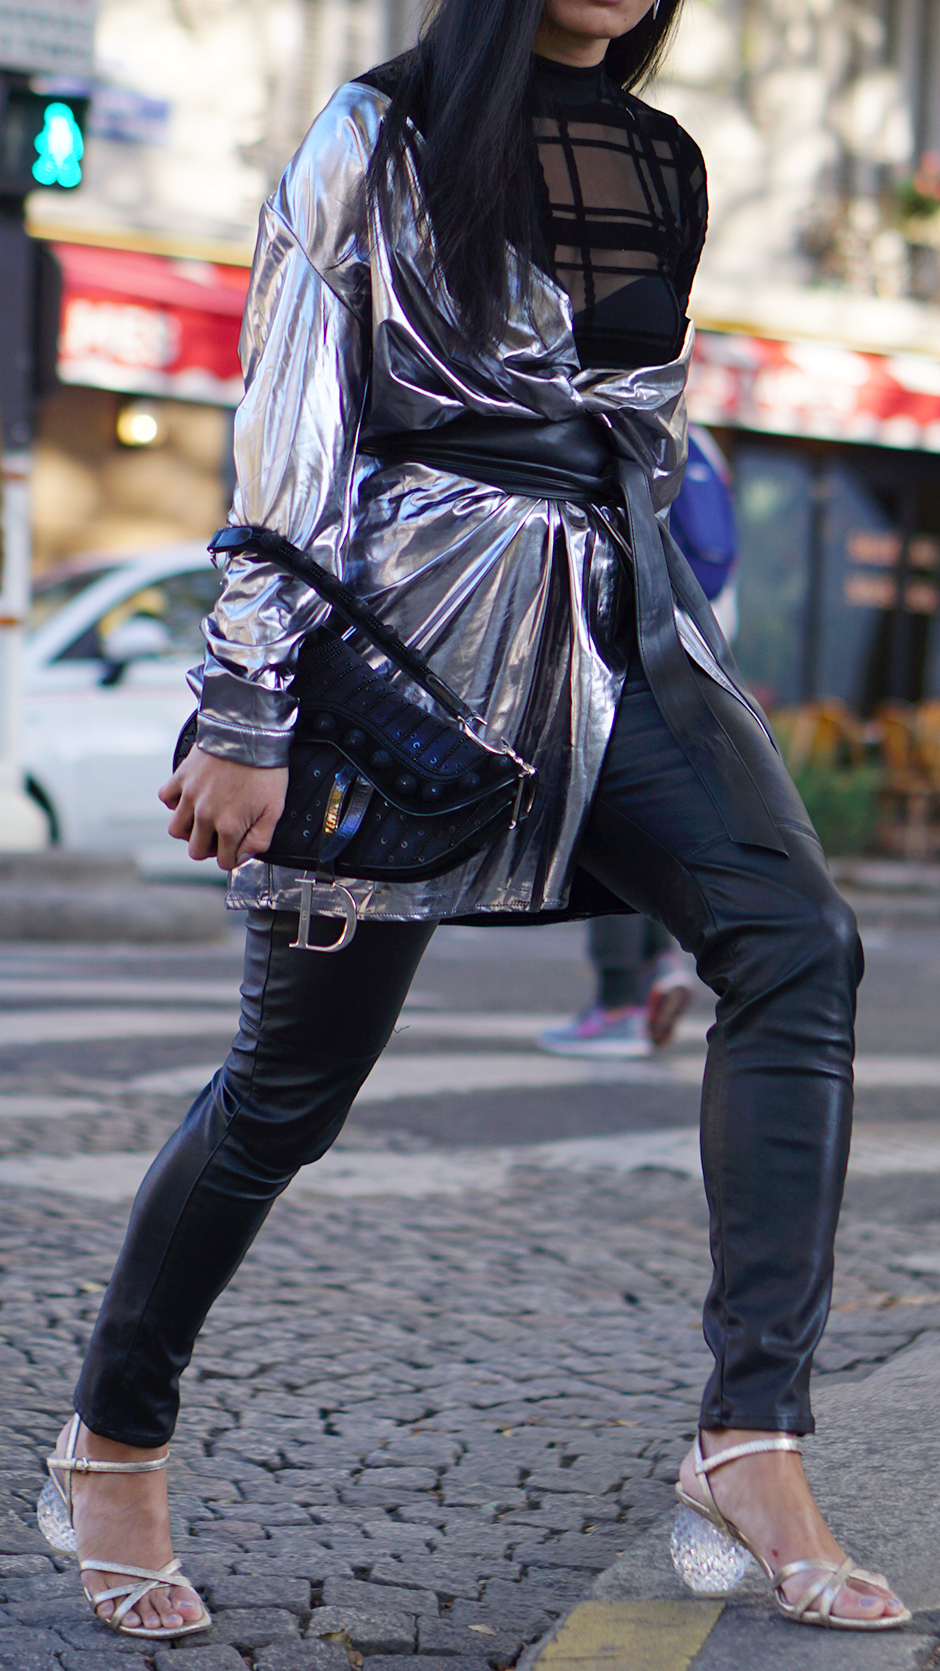 Paris Fashion Week Street Style Fall 2018 #Street #Fashion #Blog #Blogger #pfw #pfw2018 #ss18 #fw18 #parisfashionweek #revolve #zara #boohoo #dior #diorbag #diorsaddle #metallo #metallicdress #silverdress #statementheels #Paris #France #fashionblog #styleblog #streetstyle #bestoutfit #falloutfit #beststyle #stylishoutfit #fallfashion #fallstyle #outfitinspo #outfitinspiration #outfitideas